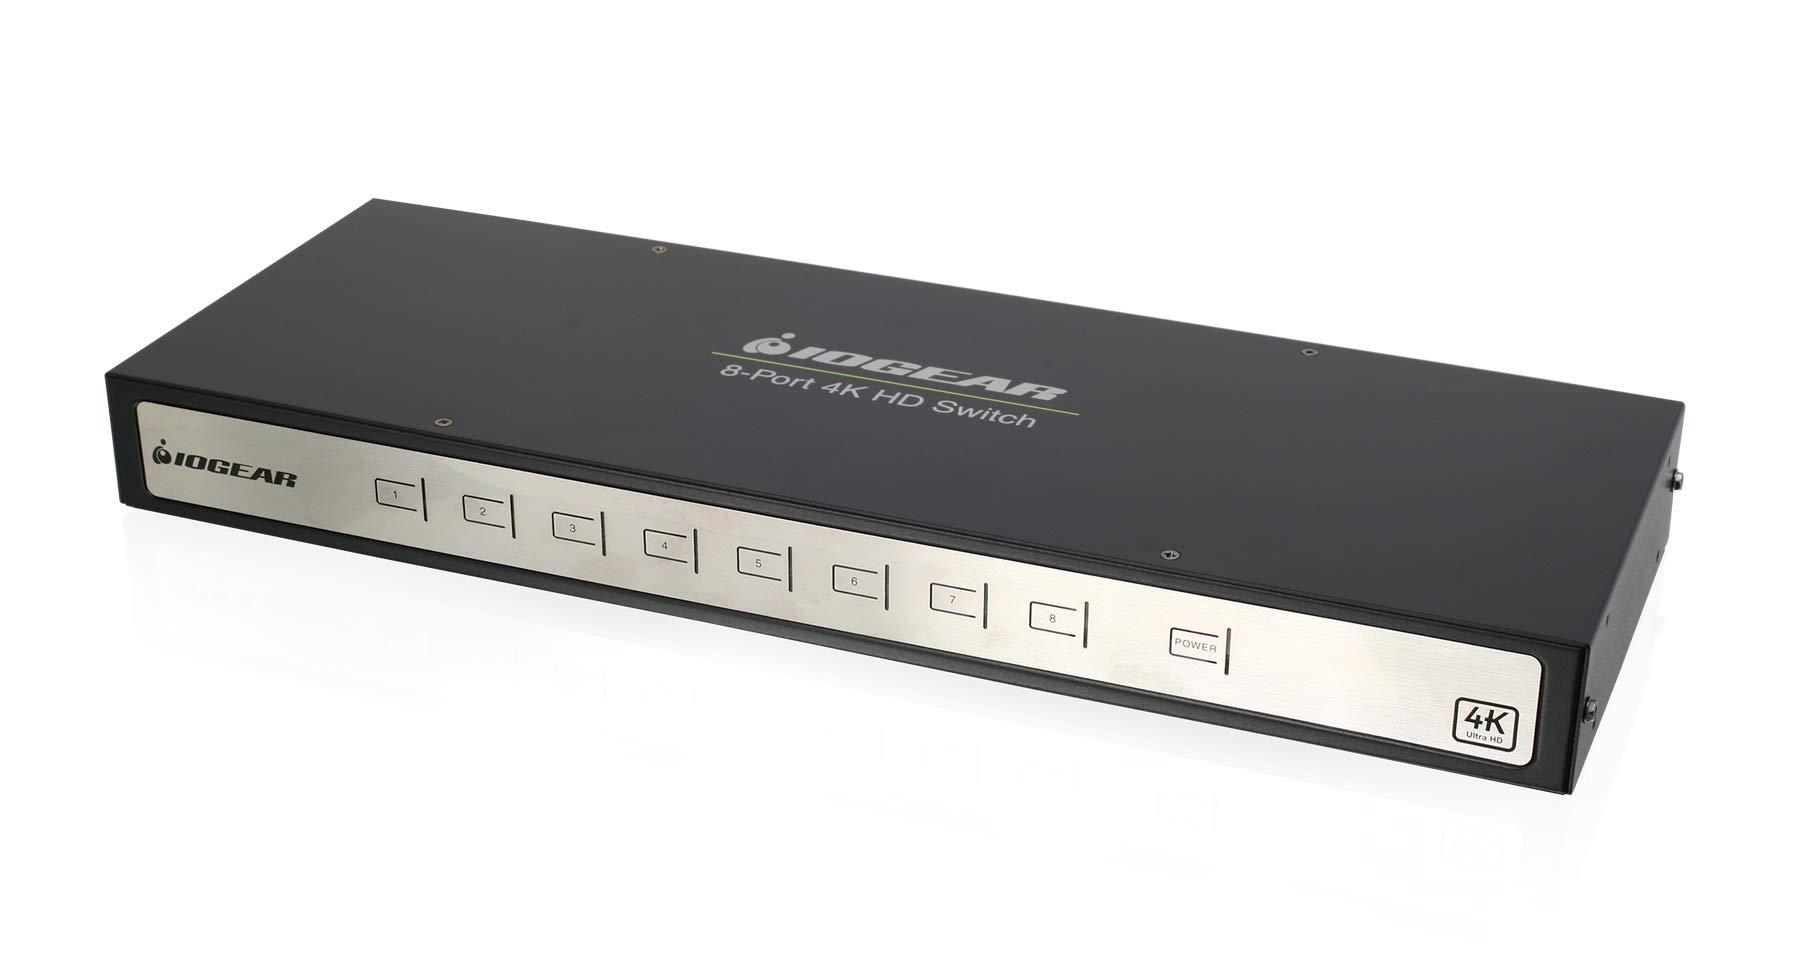 IOGEAR 4K 8-Port Switcher with HDMI (GHSW8481) by IOGEAR